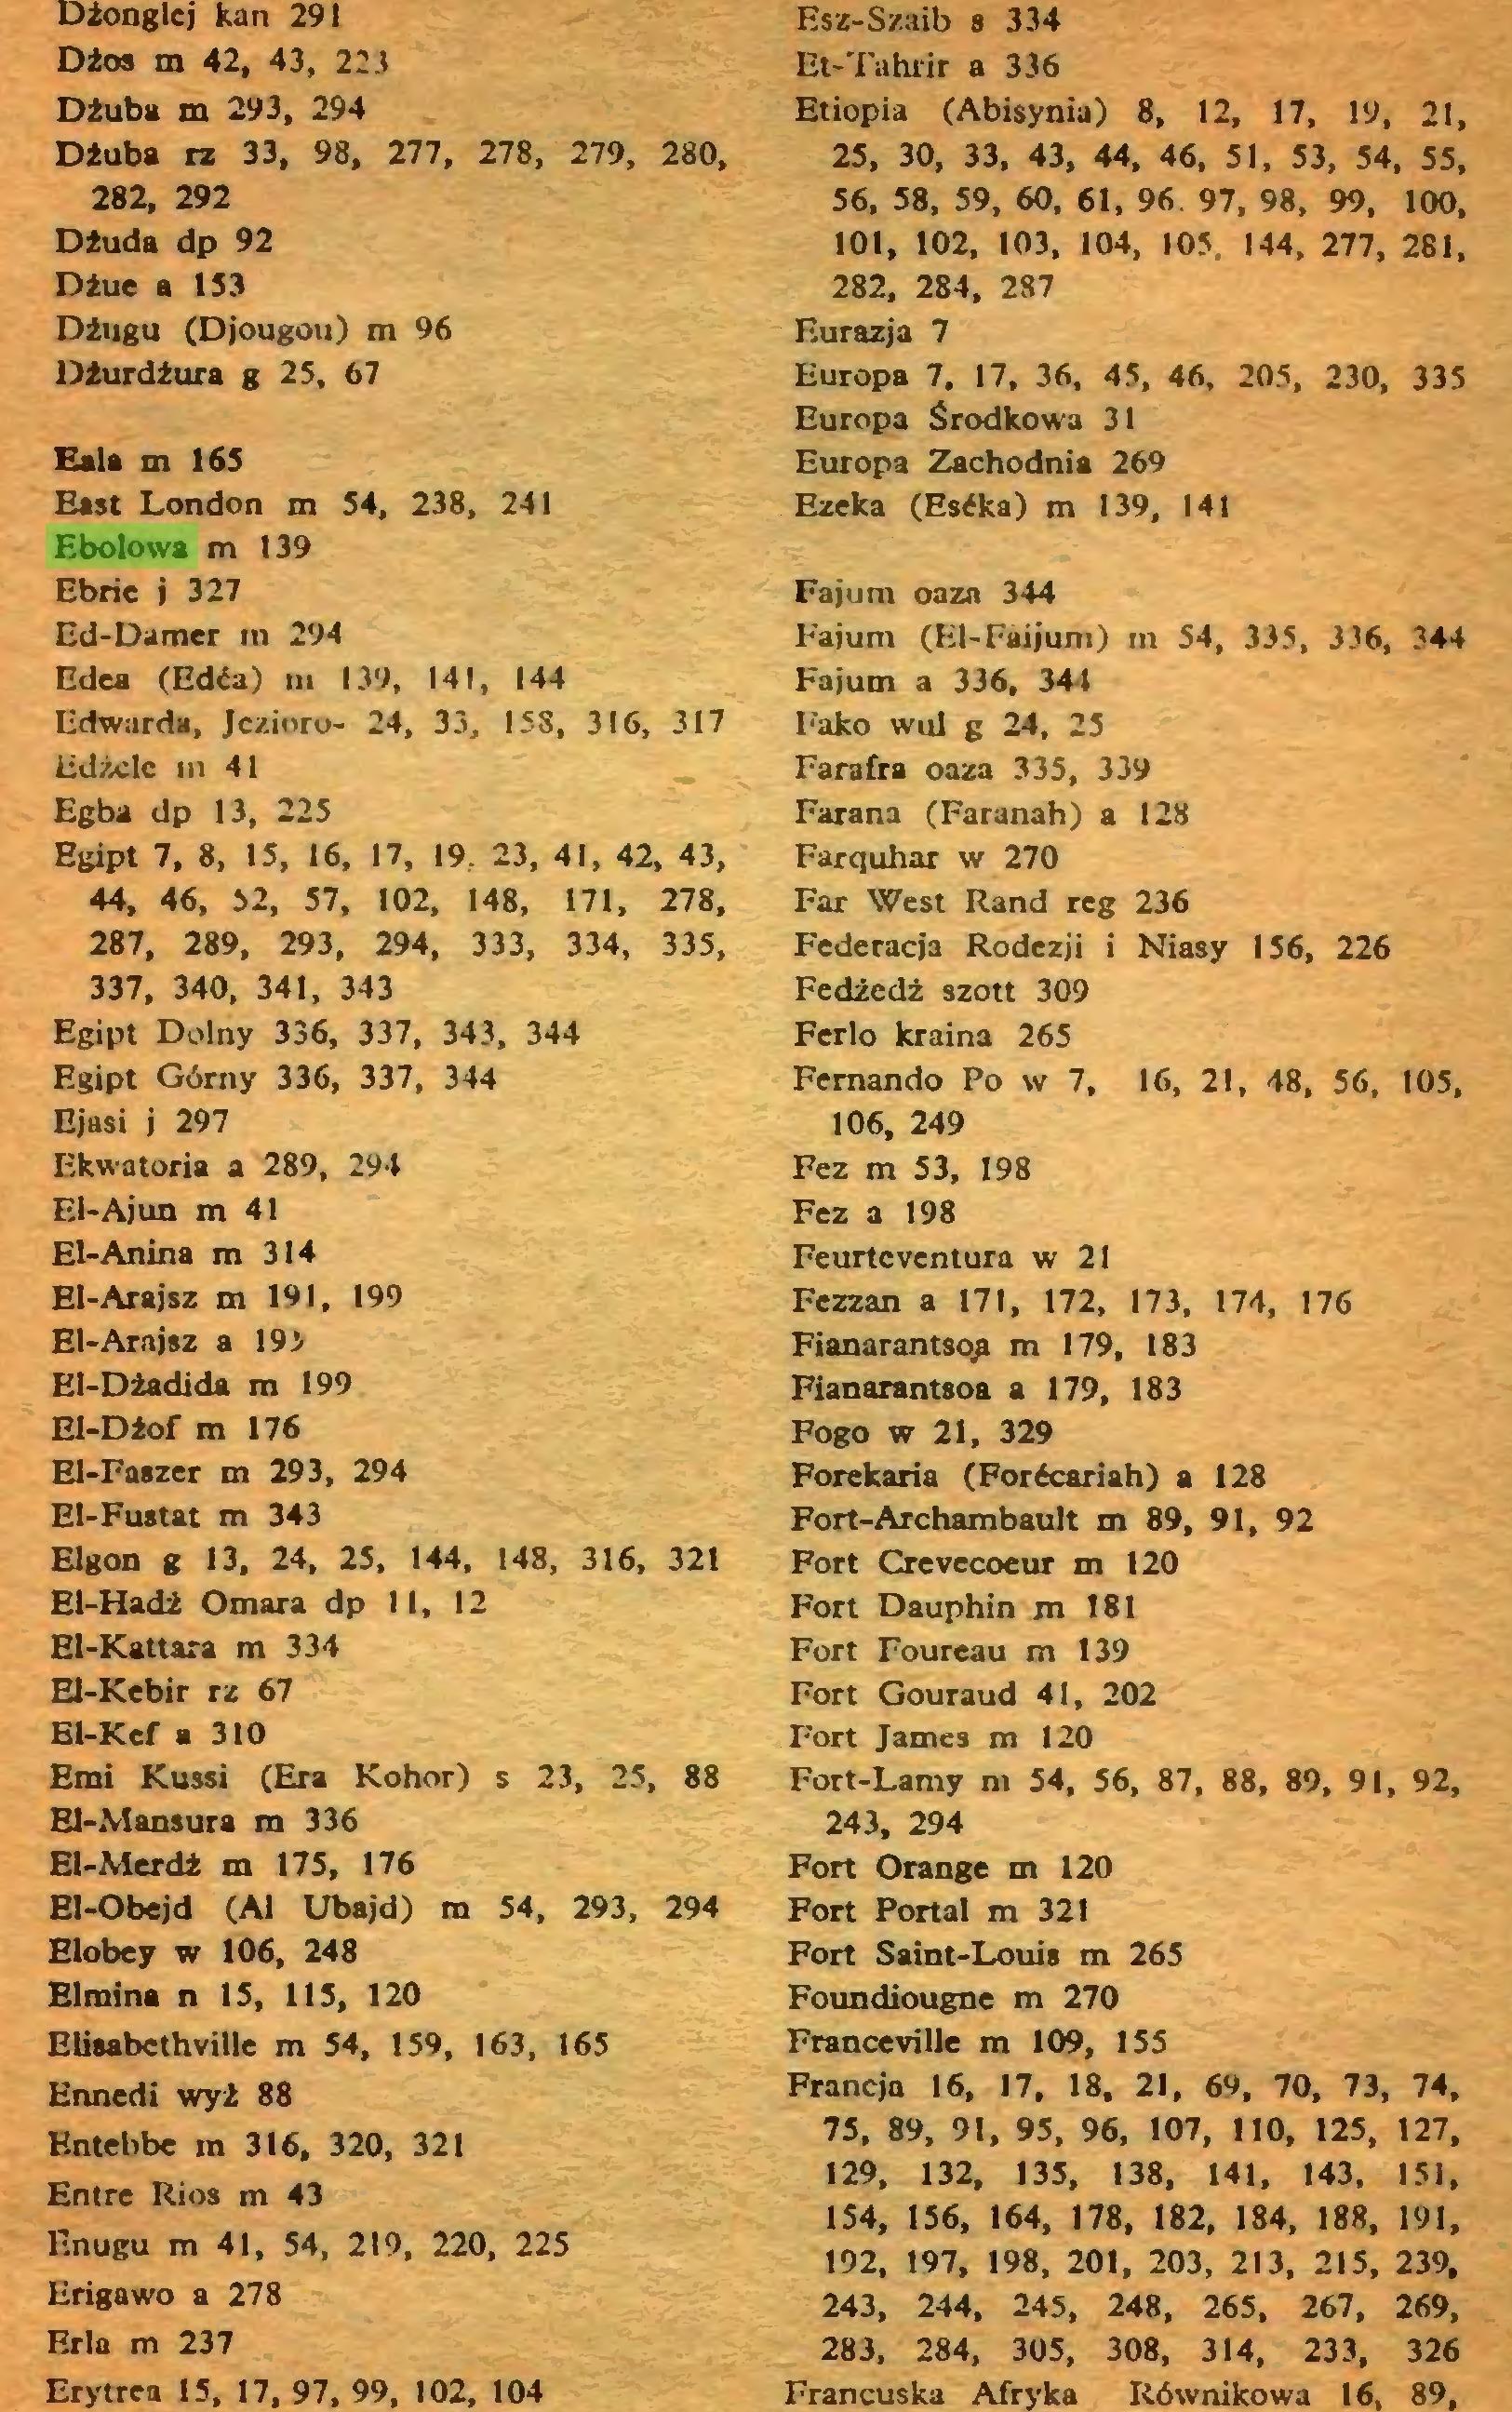 (...) Eala m 163 East London m 34, 238, 241 Ebolowa m 139 Ebrie j 327 Ed-Damer m 294 Edea (Edća) m 139, 141, 144 Edwarda, Jezioro- 24, 33, 158, 316, 317 Edżclc in 41 Eg ba dp 13, 225 Egipt 7, 8, 15, 16, 17, 19, 23, 41, 42, 43, 44, 46, 32, 57, 102, 148, 171, 278, 287, 289, 293, 294, 333, 334, 335, 337, 340, 341, 343 Egipt Dolny 336, 337, 343, 344 Egipt Górny 336, 337, 344 Ejasi j 297 Ekwatoria a 289, 294 El-Ajun m 41 El-Anina m 314 El-Arajsz m 191, 199 El-Arnjsz a 19> El-Dżadida m 199 El-Dżof m 176 El-Faszer m 293, 294 EI-Fustat m 343 Elgon g 13, 24, 25, 144, 148, 316, 321 El-Hadż Omara dp II, 12 El-Kattara m 334 El-Kebir rz 67 Bl-Kcf a 310 Emi Kussi (Era Kohor) s 23, 25, 88 El-Mansura m 336 El-Merdż m 175, 176 El-Obejd (Al Ubajd) m 54, 293, 294 Elobey w 106, 248 Elraina n 15, 115, 120 BliaabcthviUe m 54, 159, 163, 165 Ennedi wyż 88 Entebbe m 316, 320, 321 Entre Rios m 43 Enugu m 41, 54, 219, 220, 225 Erigawo a 278 Erla m 237 Erytrea 15, 17, 97, 99, 102, 104 Esz-Szaib s 334 Et-Tahrir a 336 Etiopia (Abisynia) 8, 12, 17, 19, 21, 25, 30, 33, 43, 44, 46, 51, 53, 54, 55, 56, 58, 59, 60, 61, 96. 97, 98, 99, 100,...